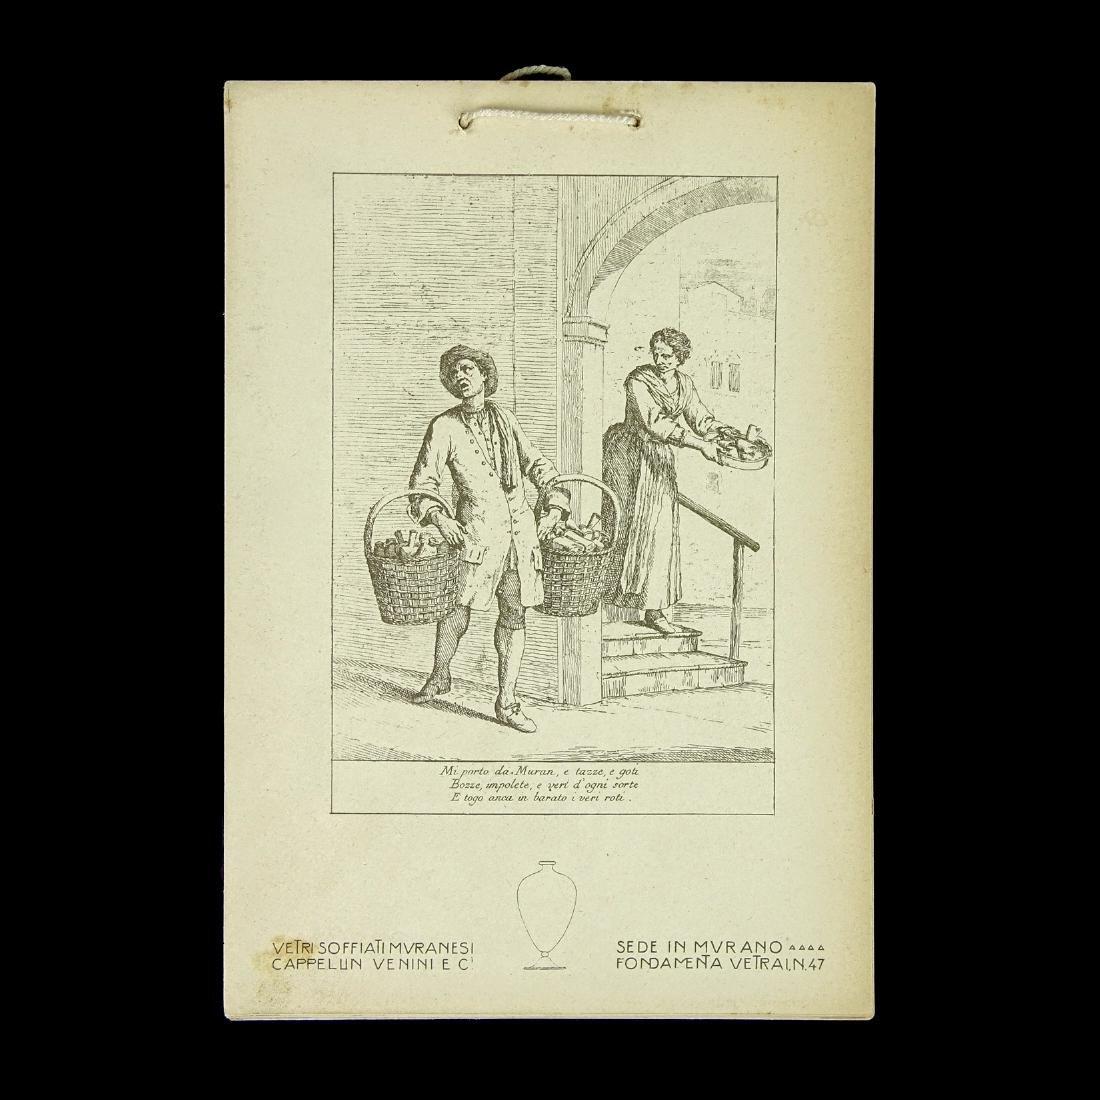 Vetri Soffiati Muranesi Cappellin 1924 Venini Calendar